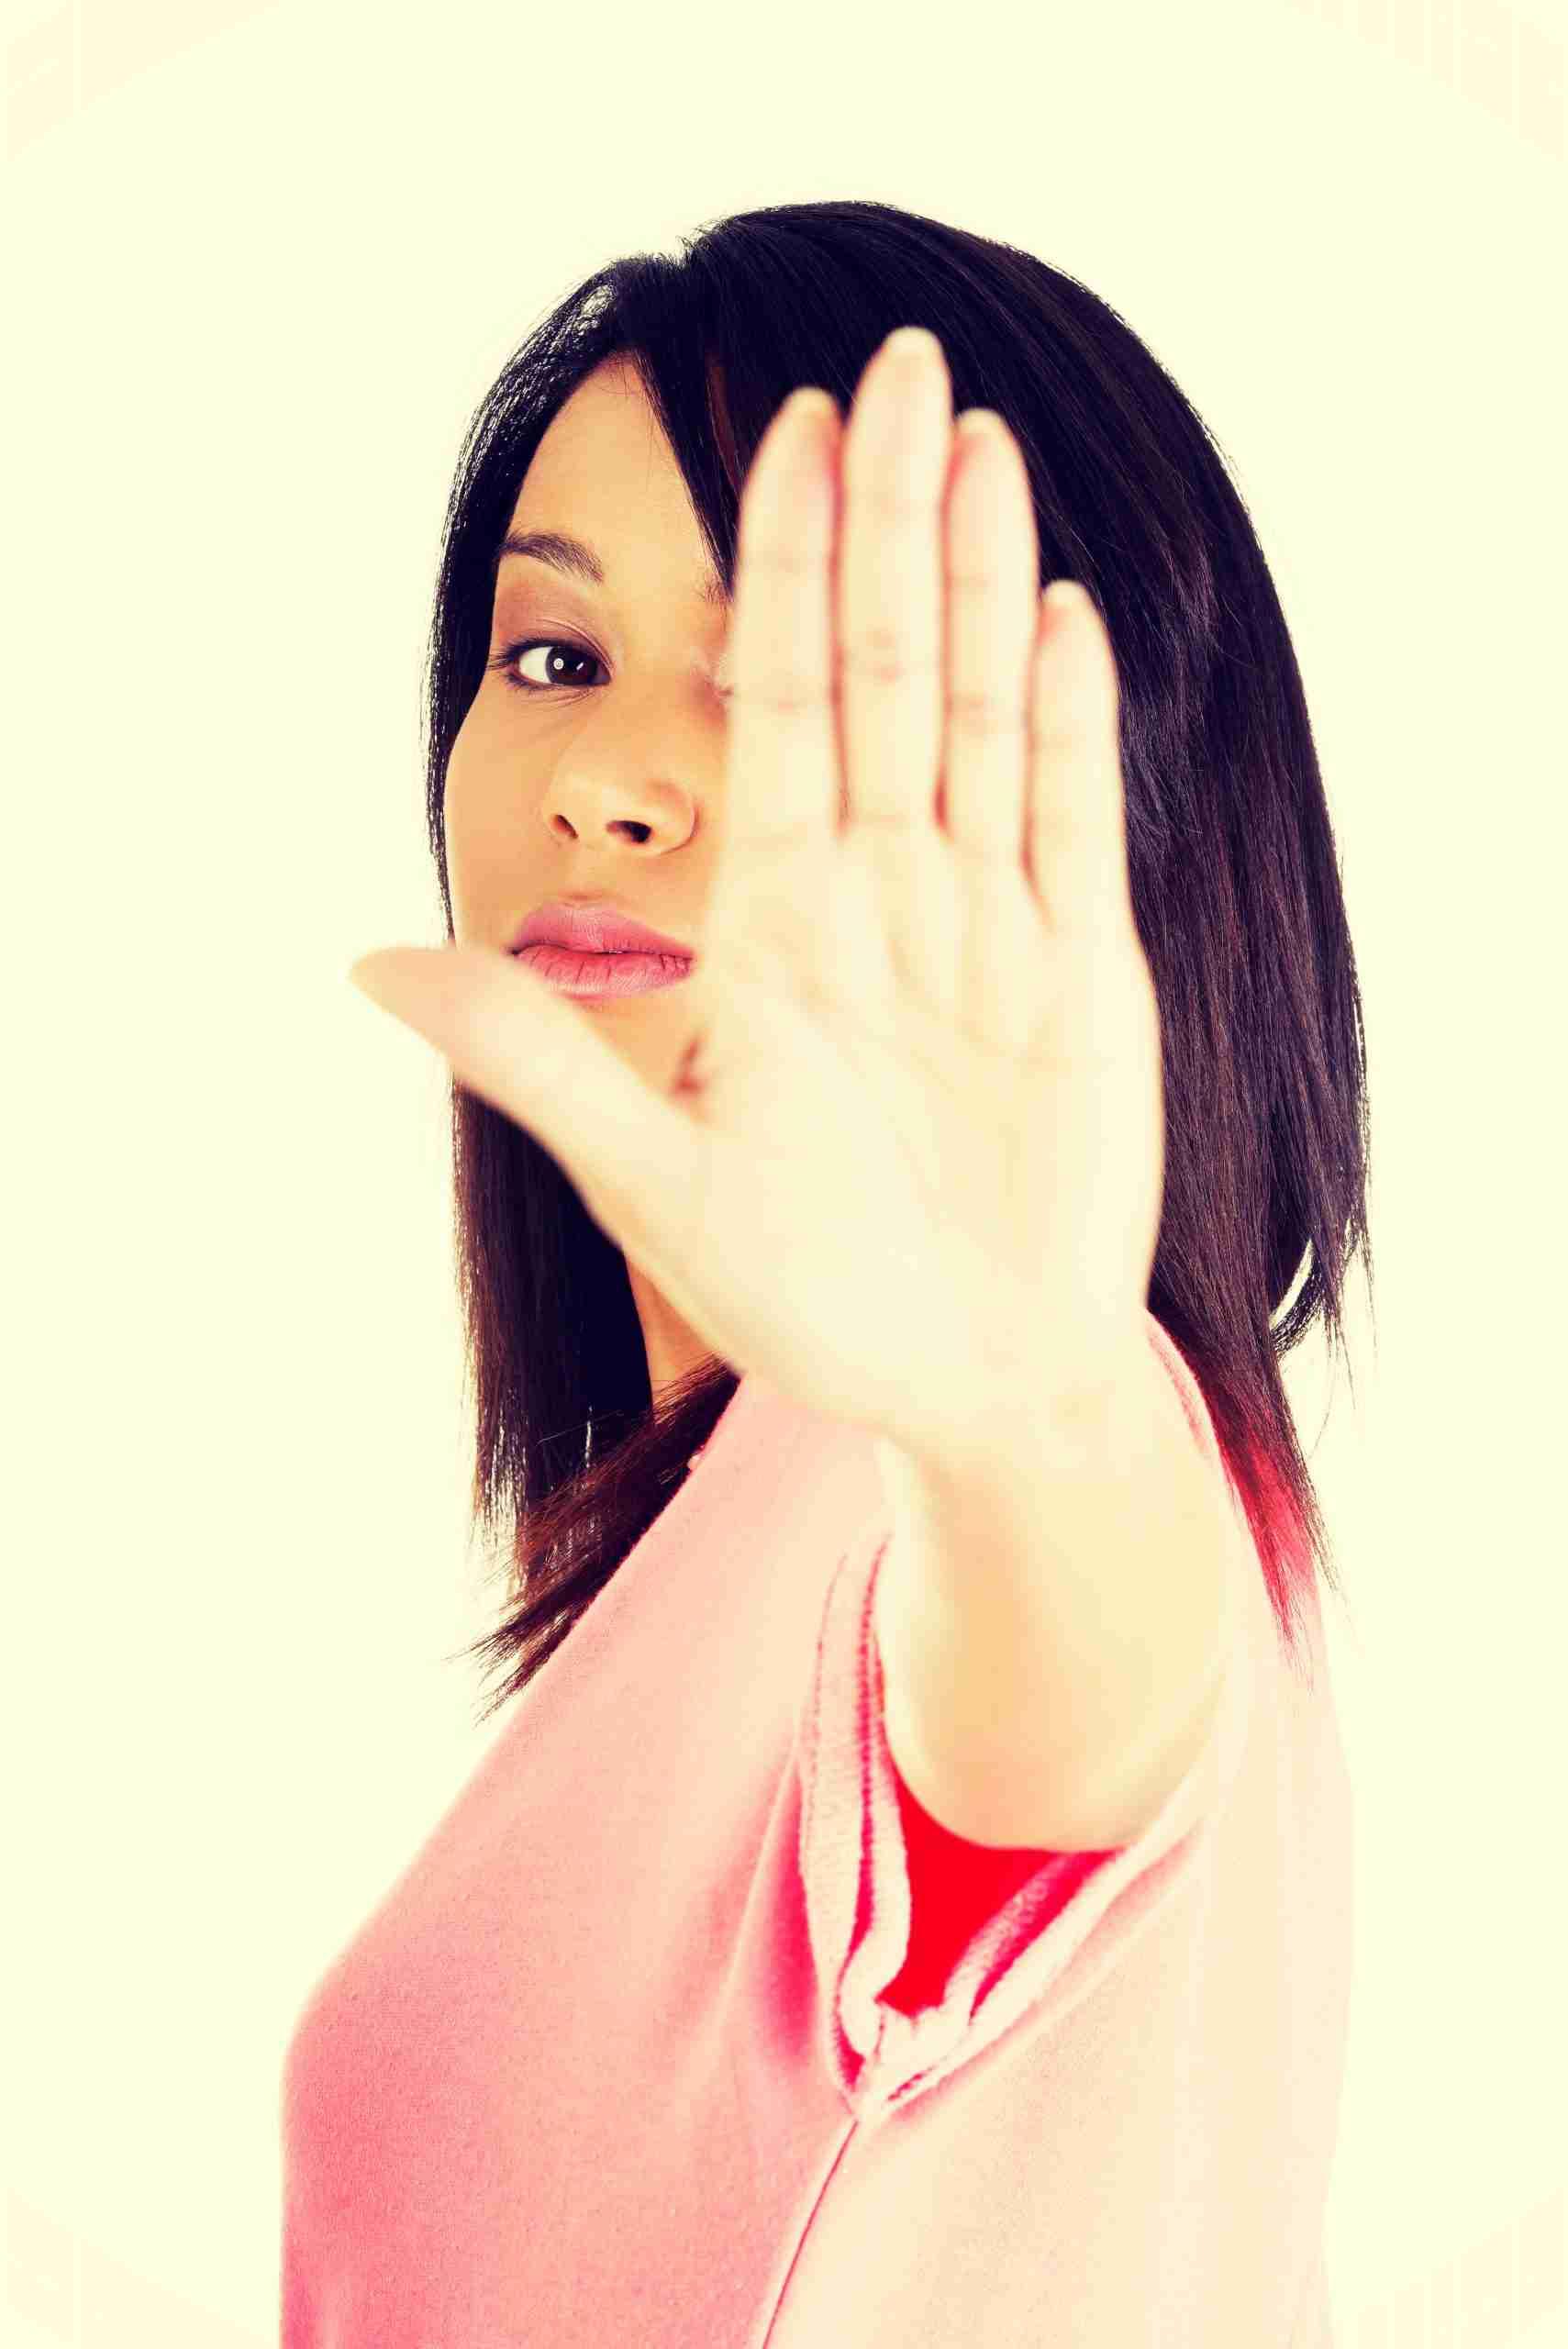 4 Common Ways You Push Love Away As A Single Woman